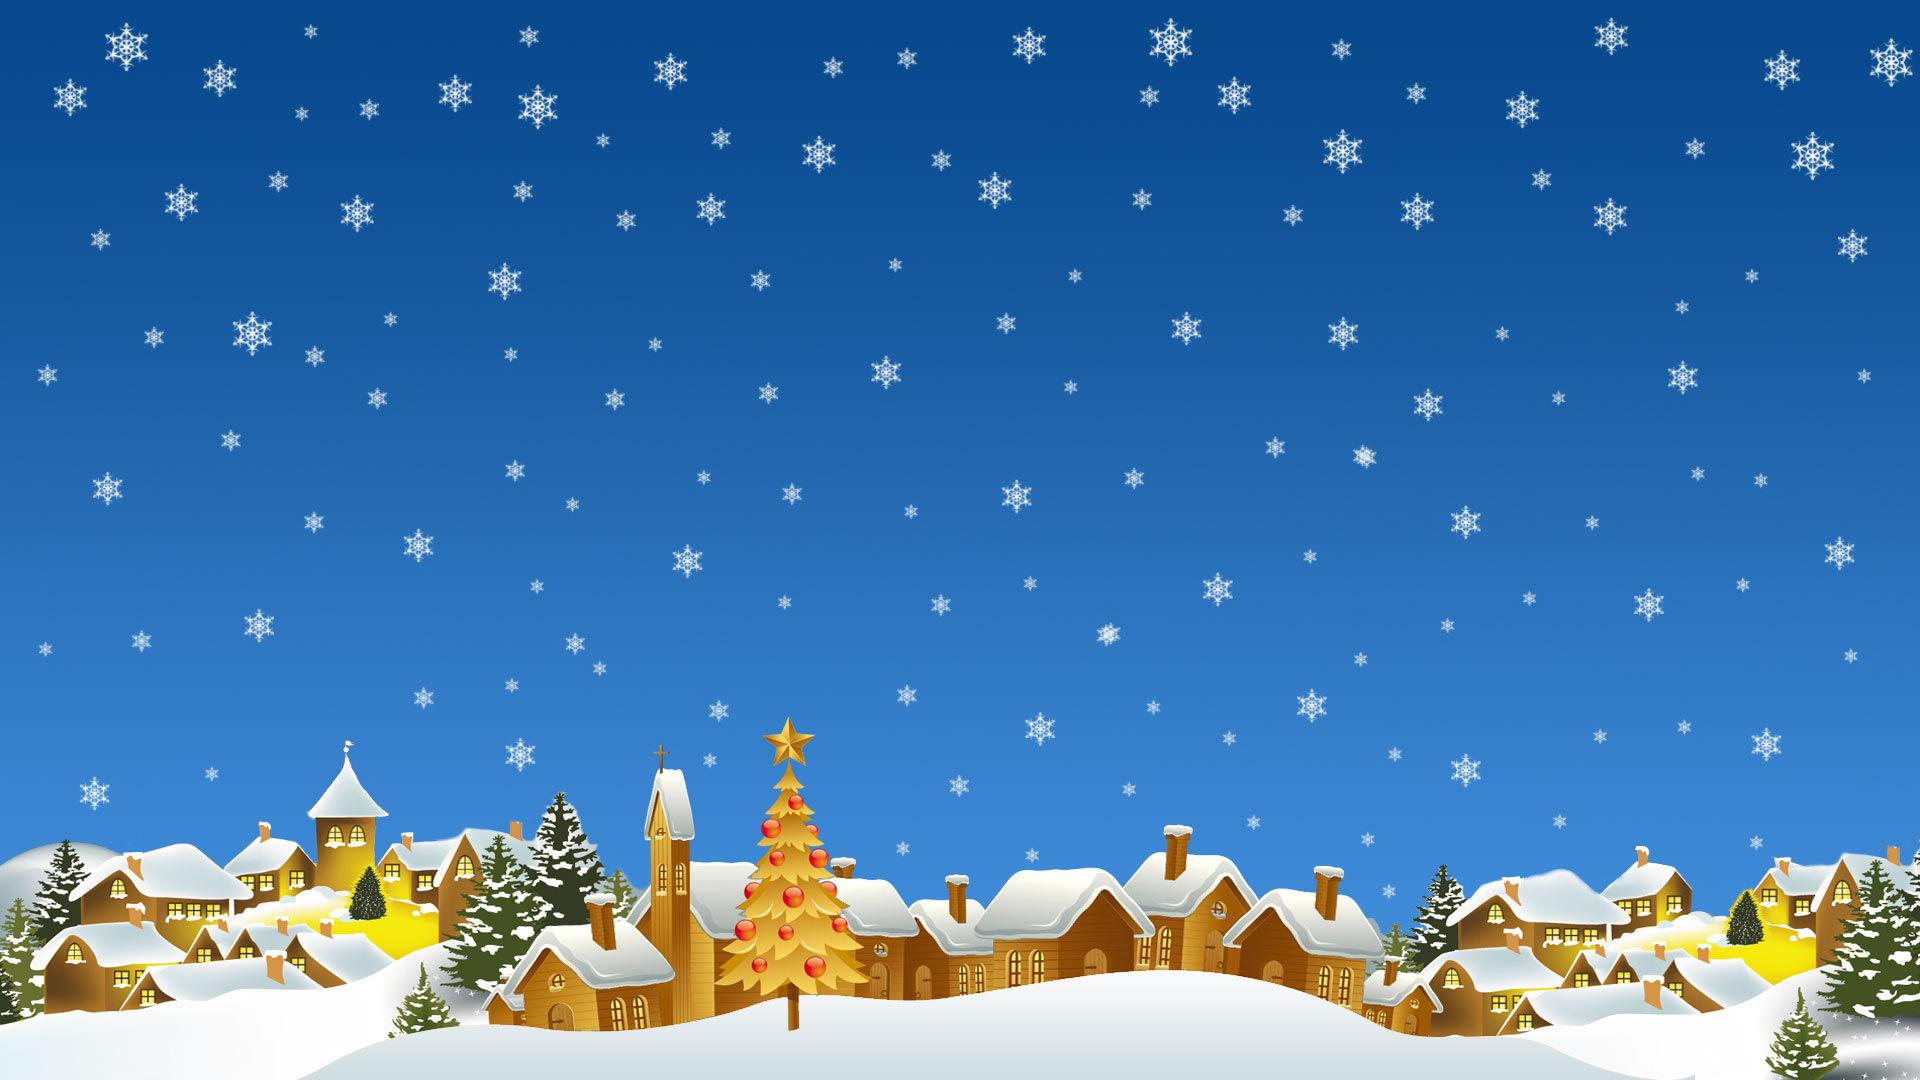 Картинка на фон рождество